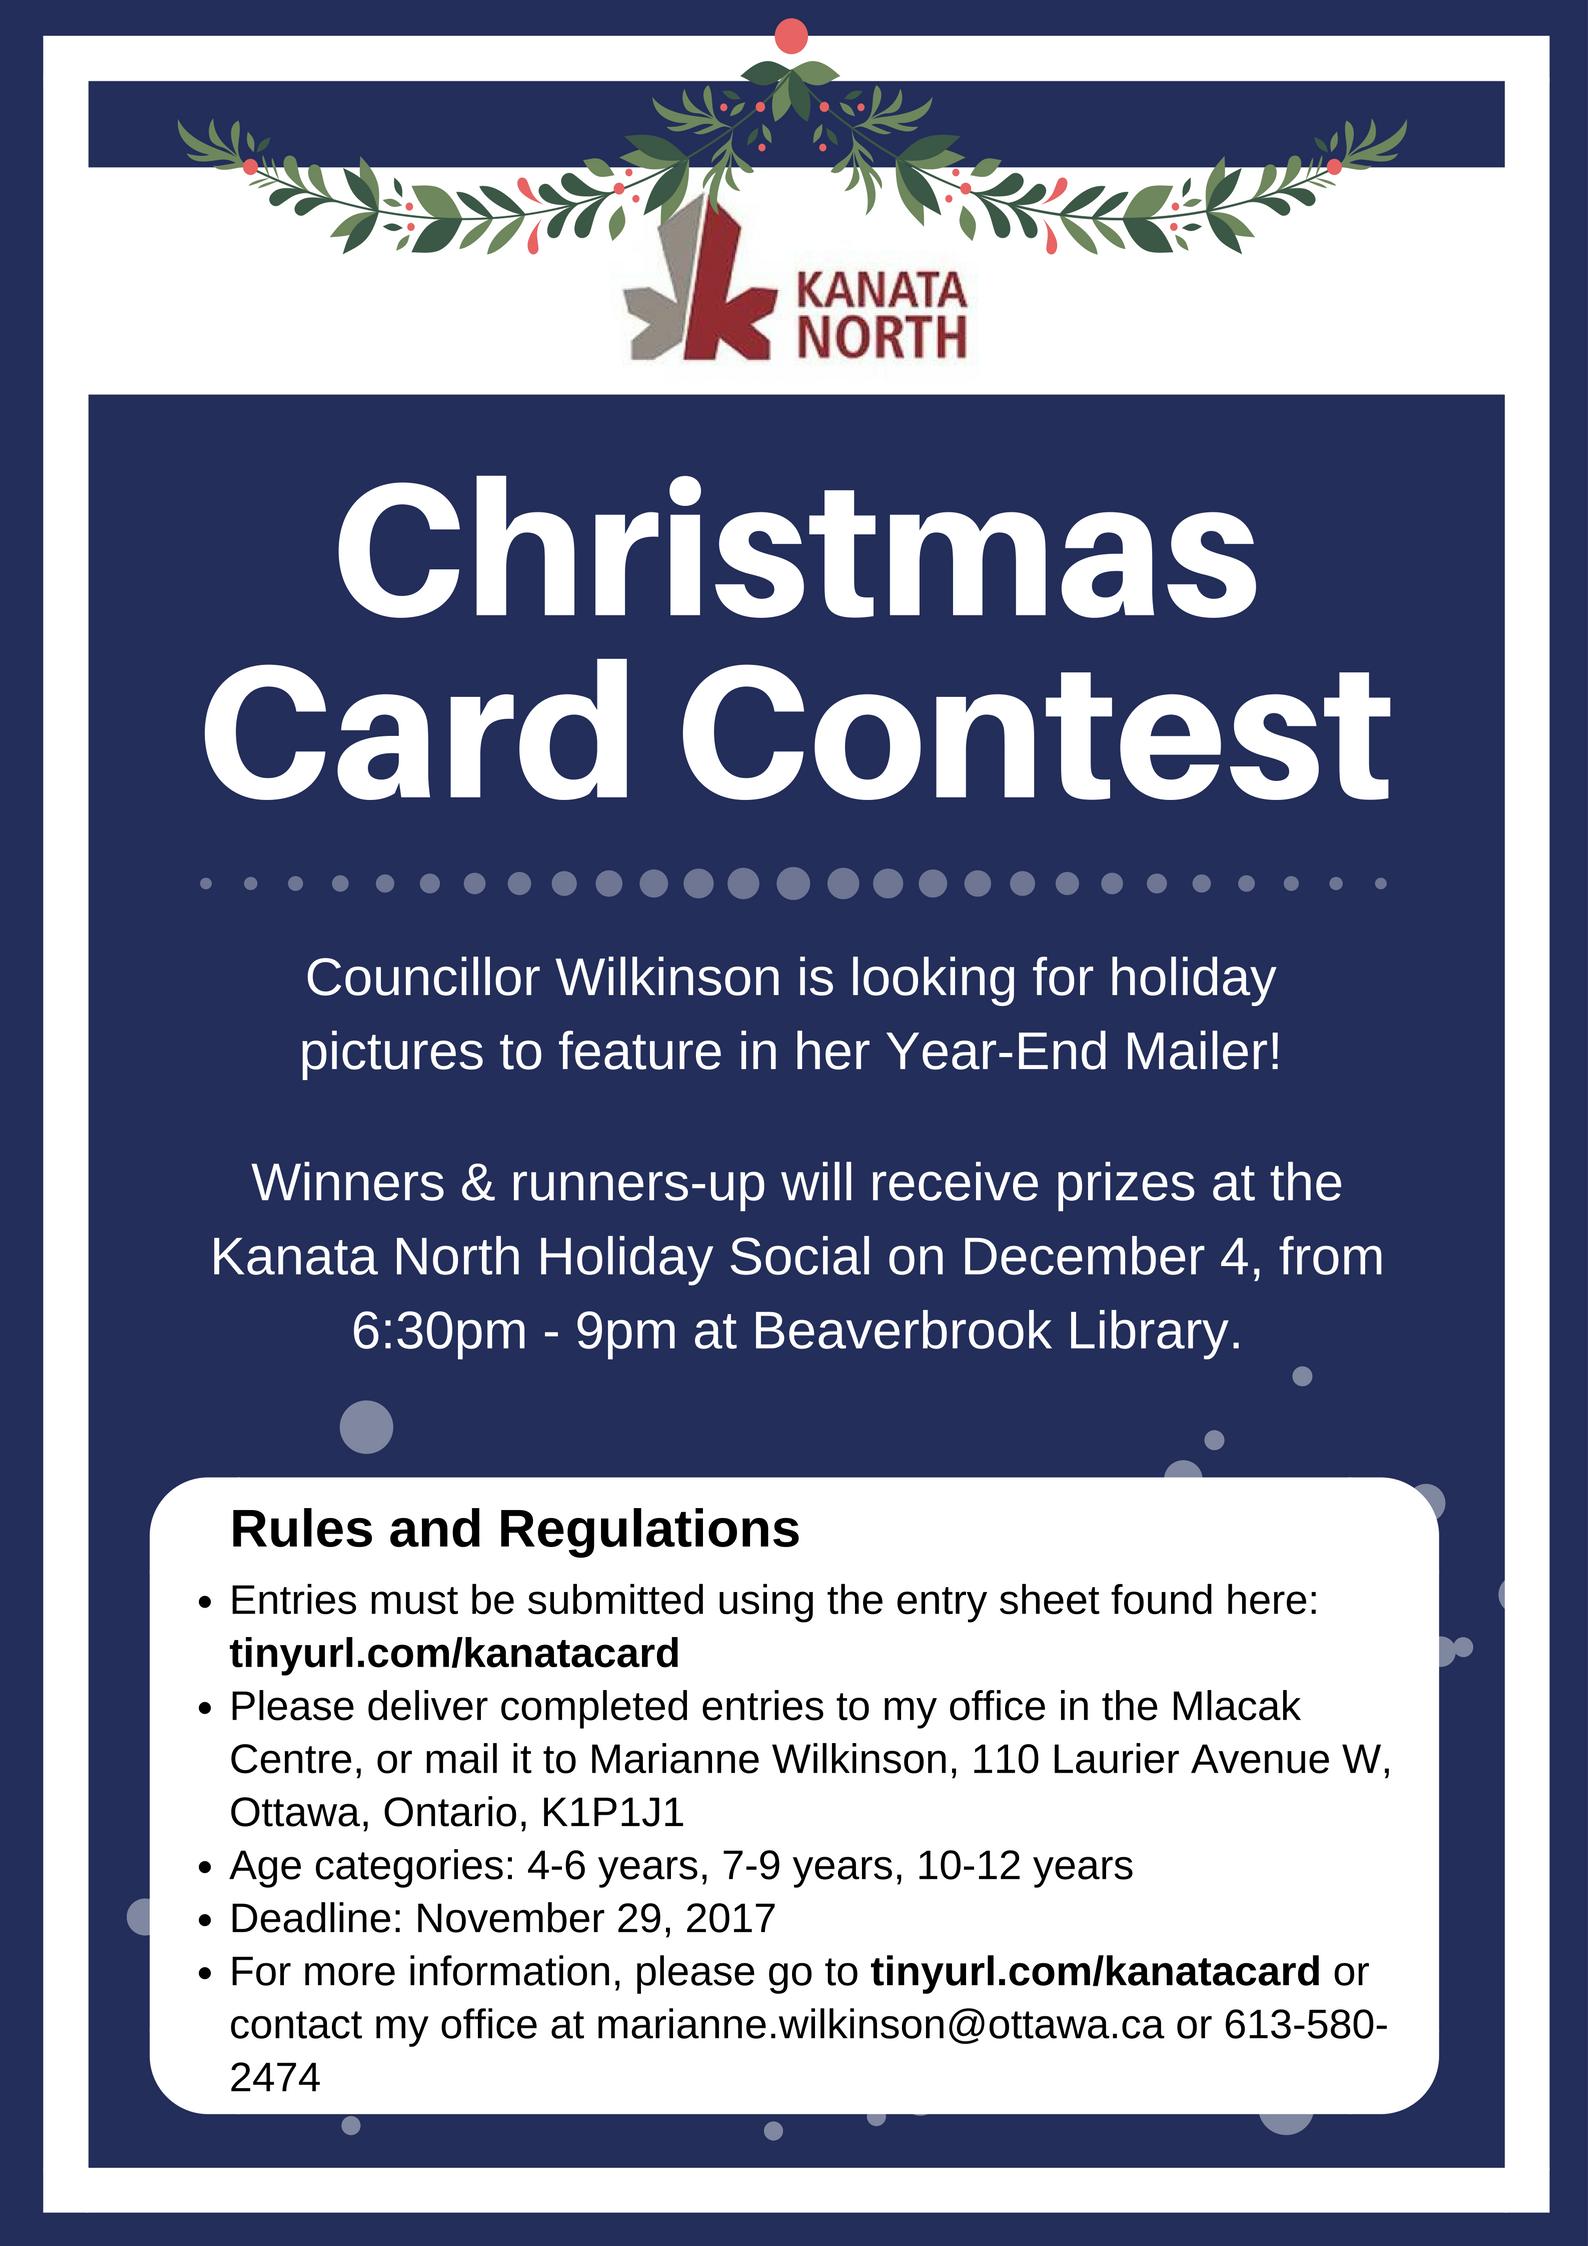 2017 Christmas Card Contest Marianne Wilkinson